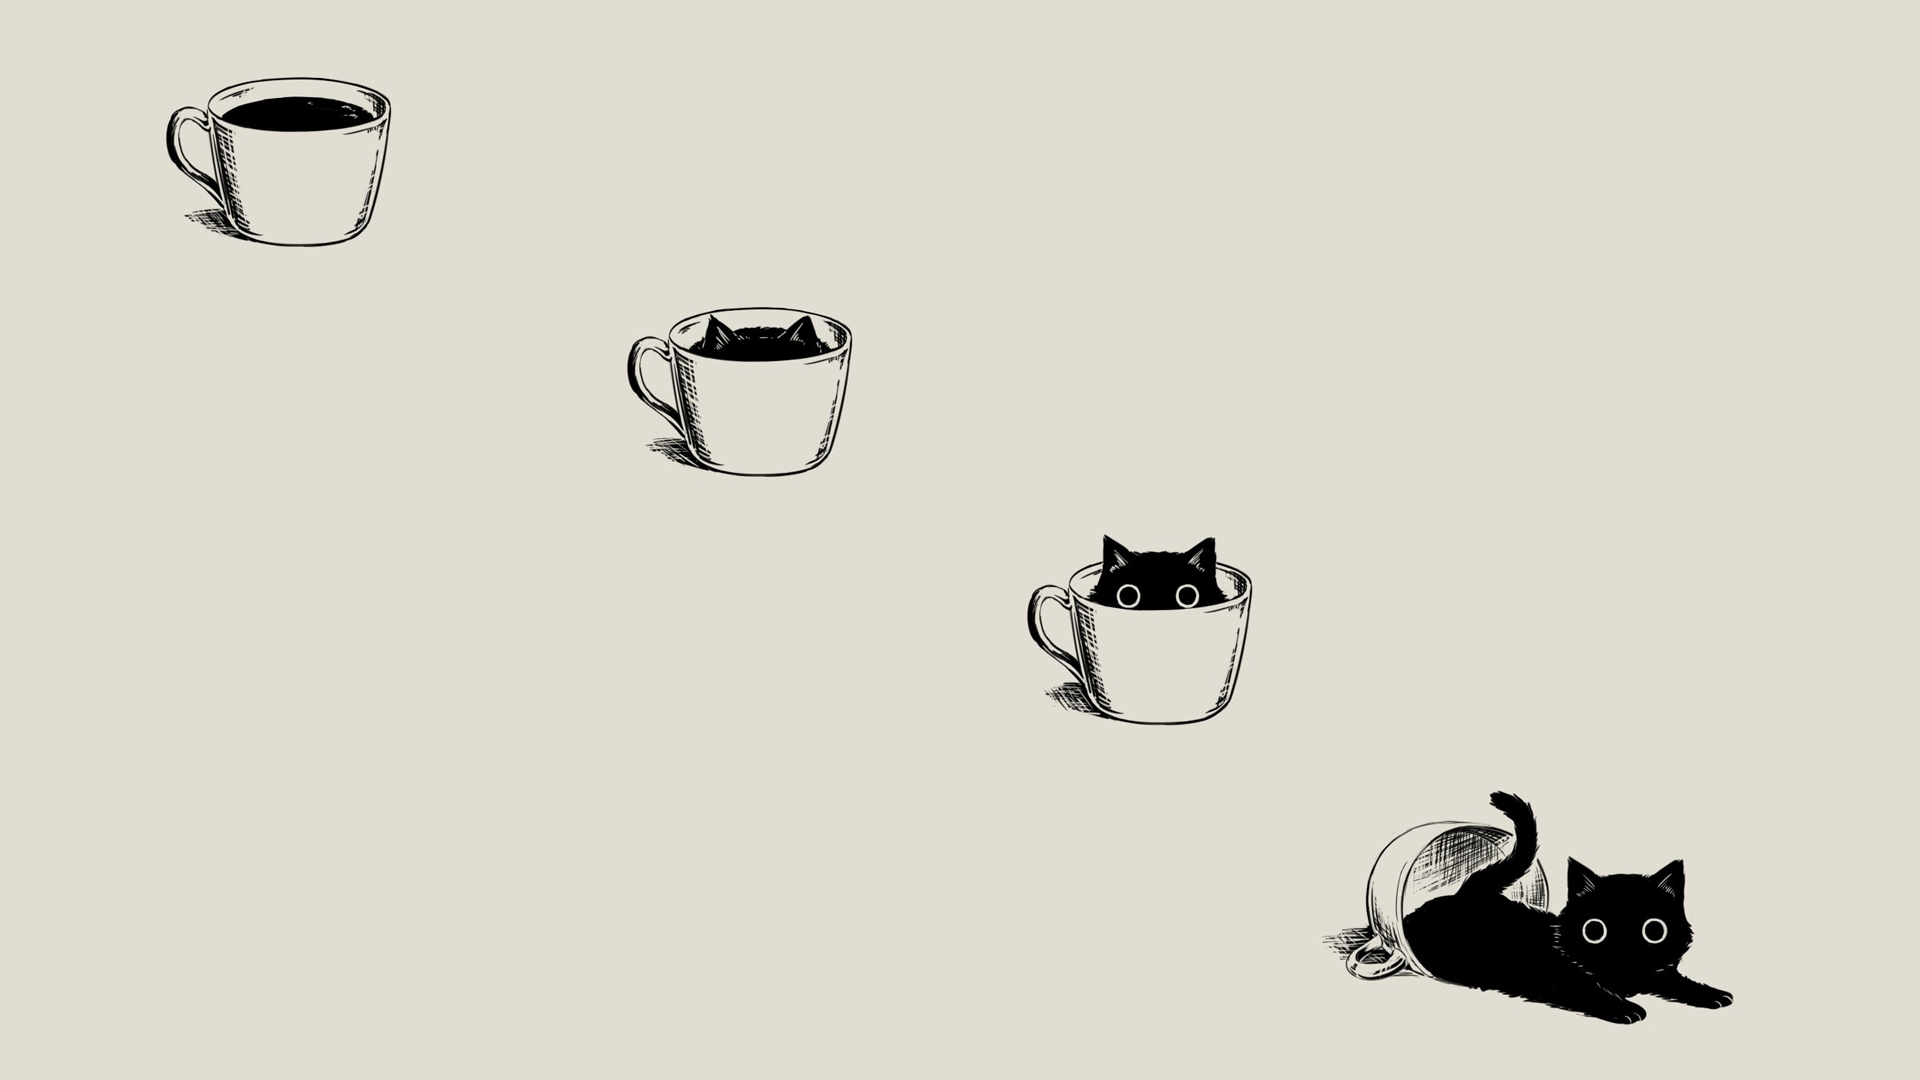 Anime 1920x1080 anime manga minimalism simple background coffee black cats beige cats animals